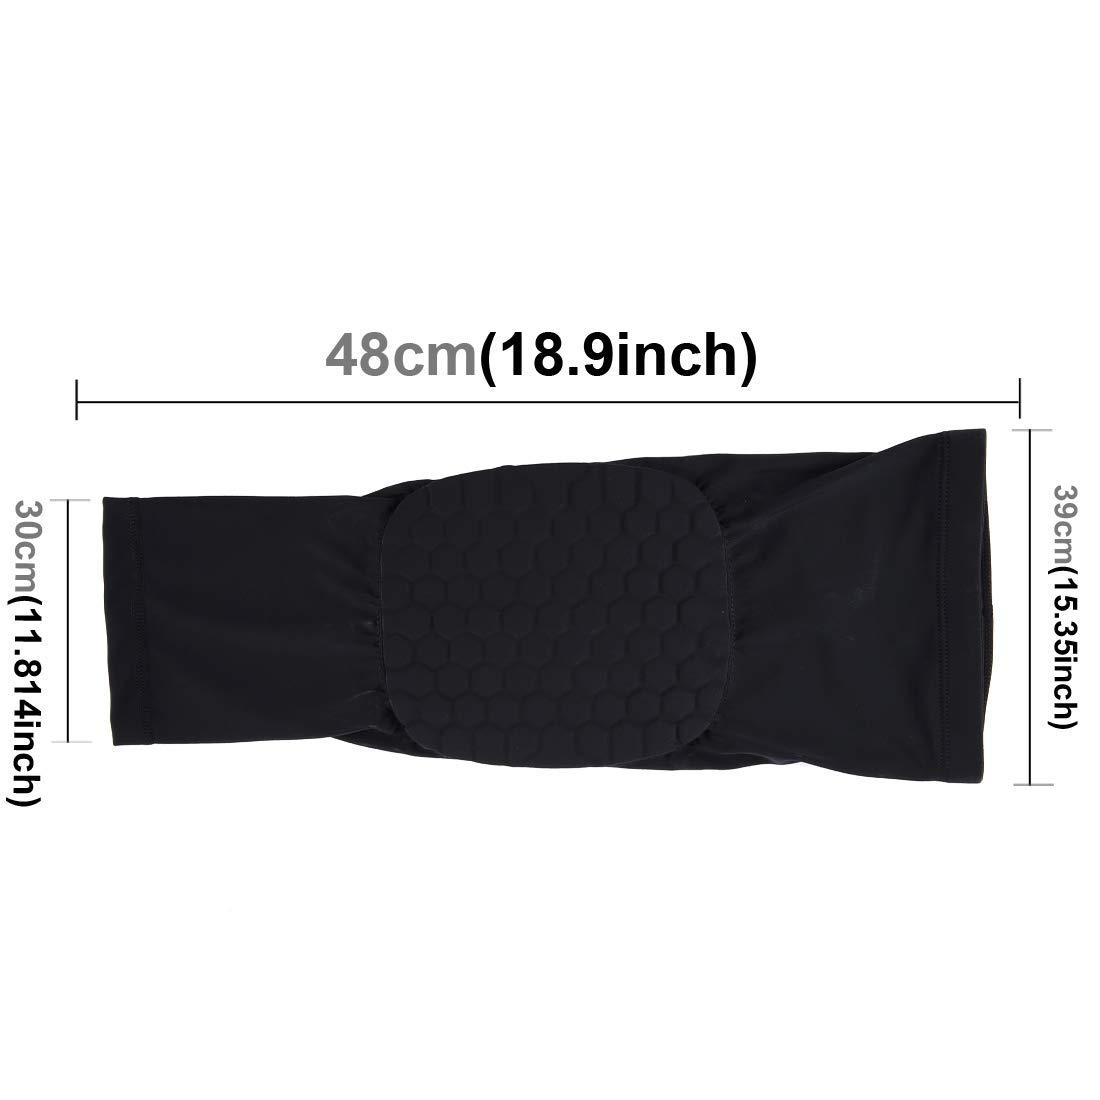 Anstorematealliance Sports&Entertainment Sports&Entertainment Factory 1 PC Beehive Shaped Sports Collision-Resistant Lycra Elastic Knee Support Guard, Long Version, Size: XL(Black) (Color : Black)